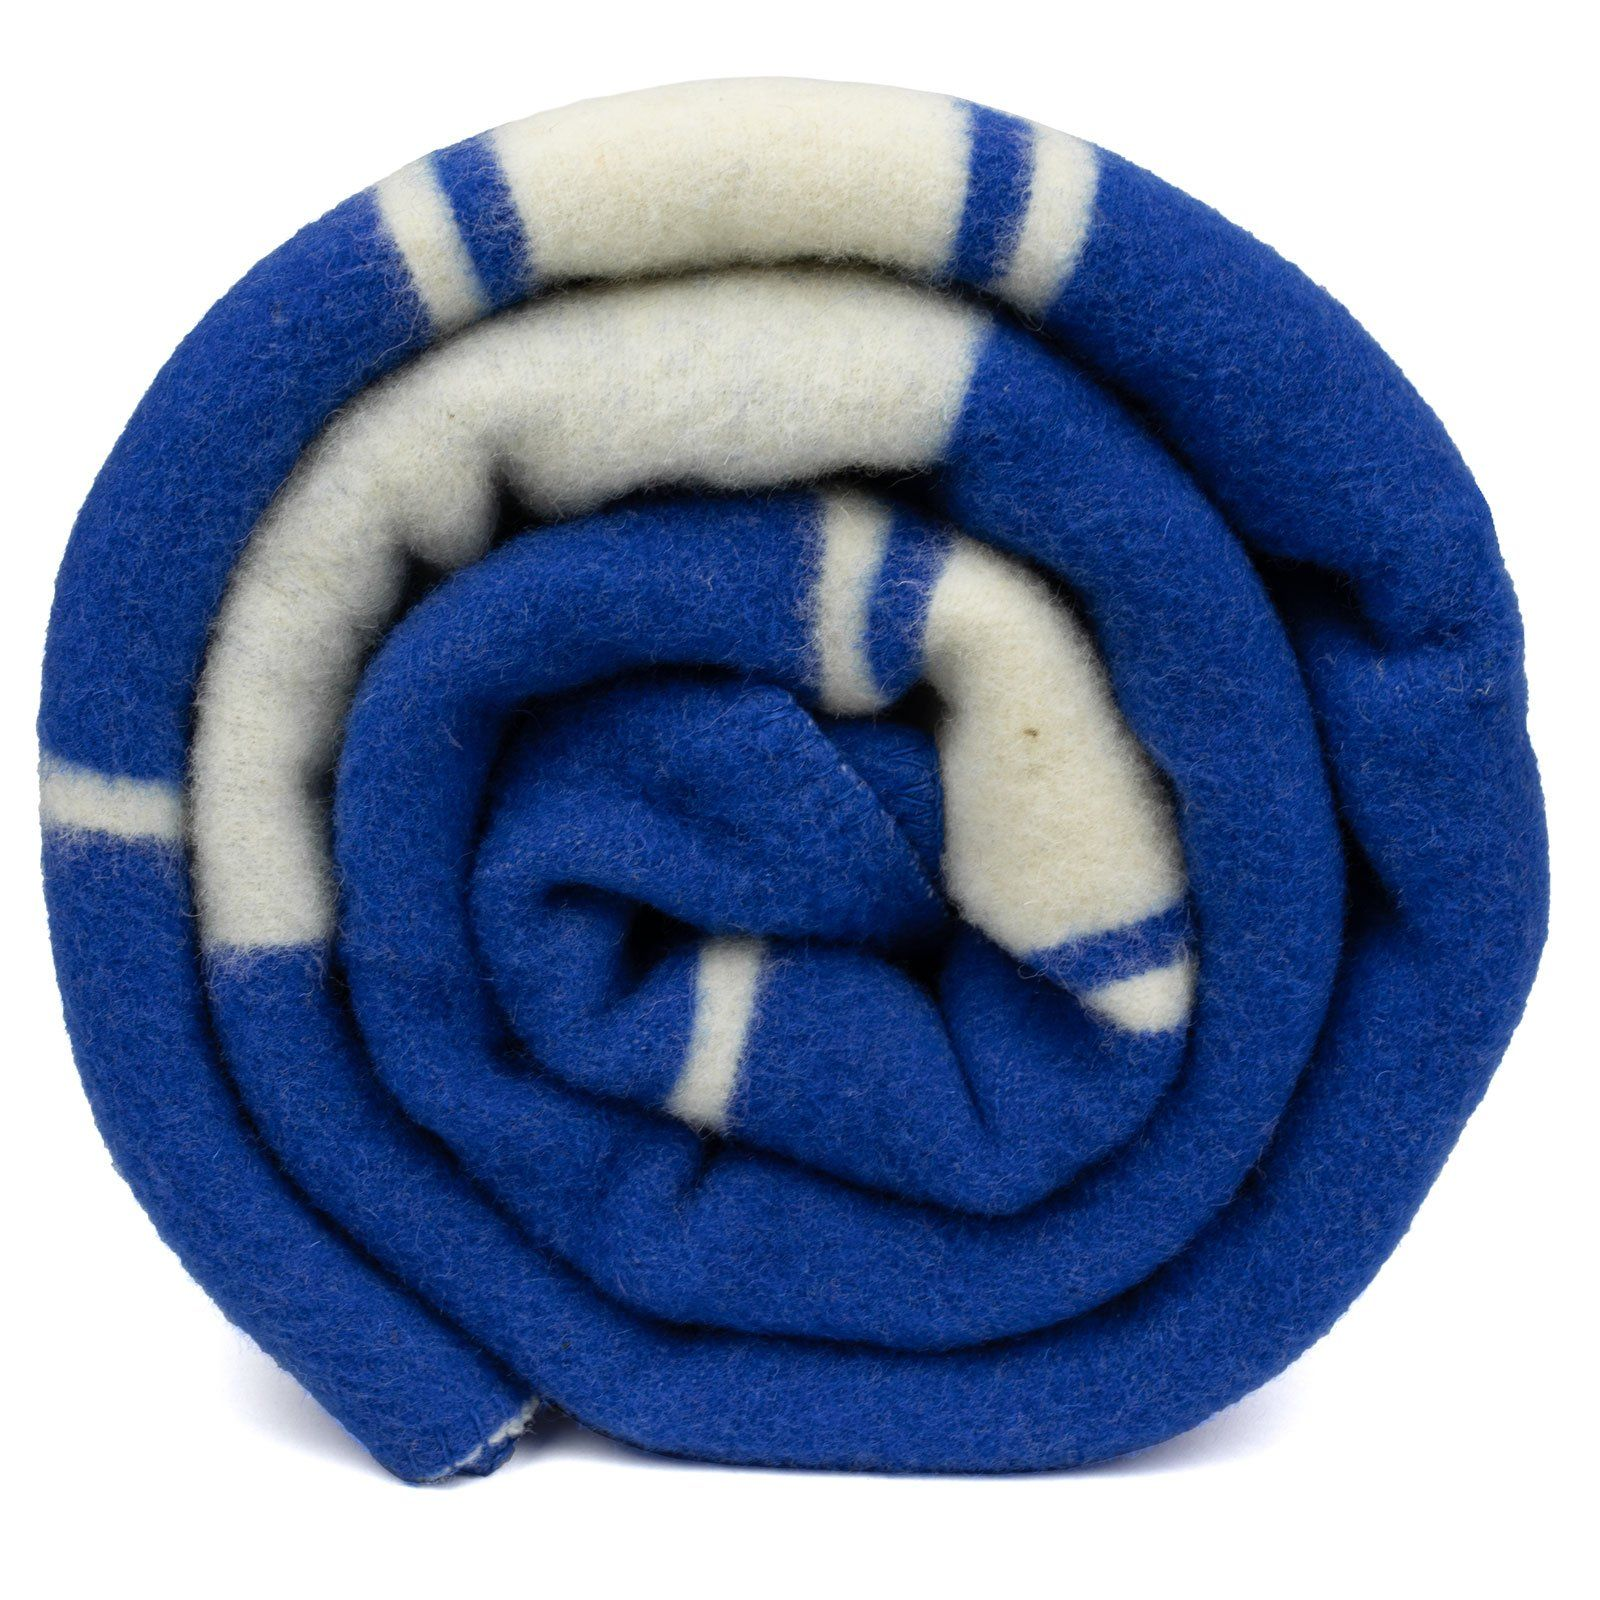 Real Italian Air Force Blanket